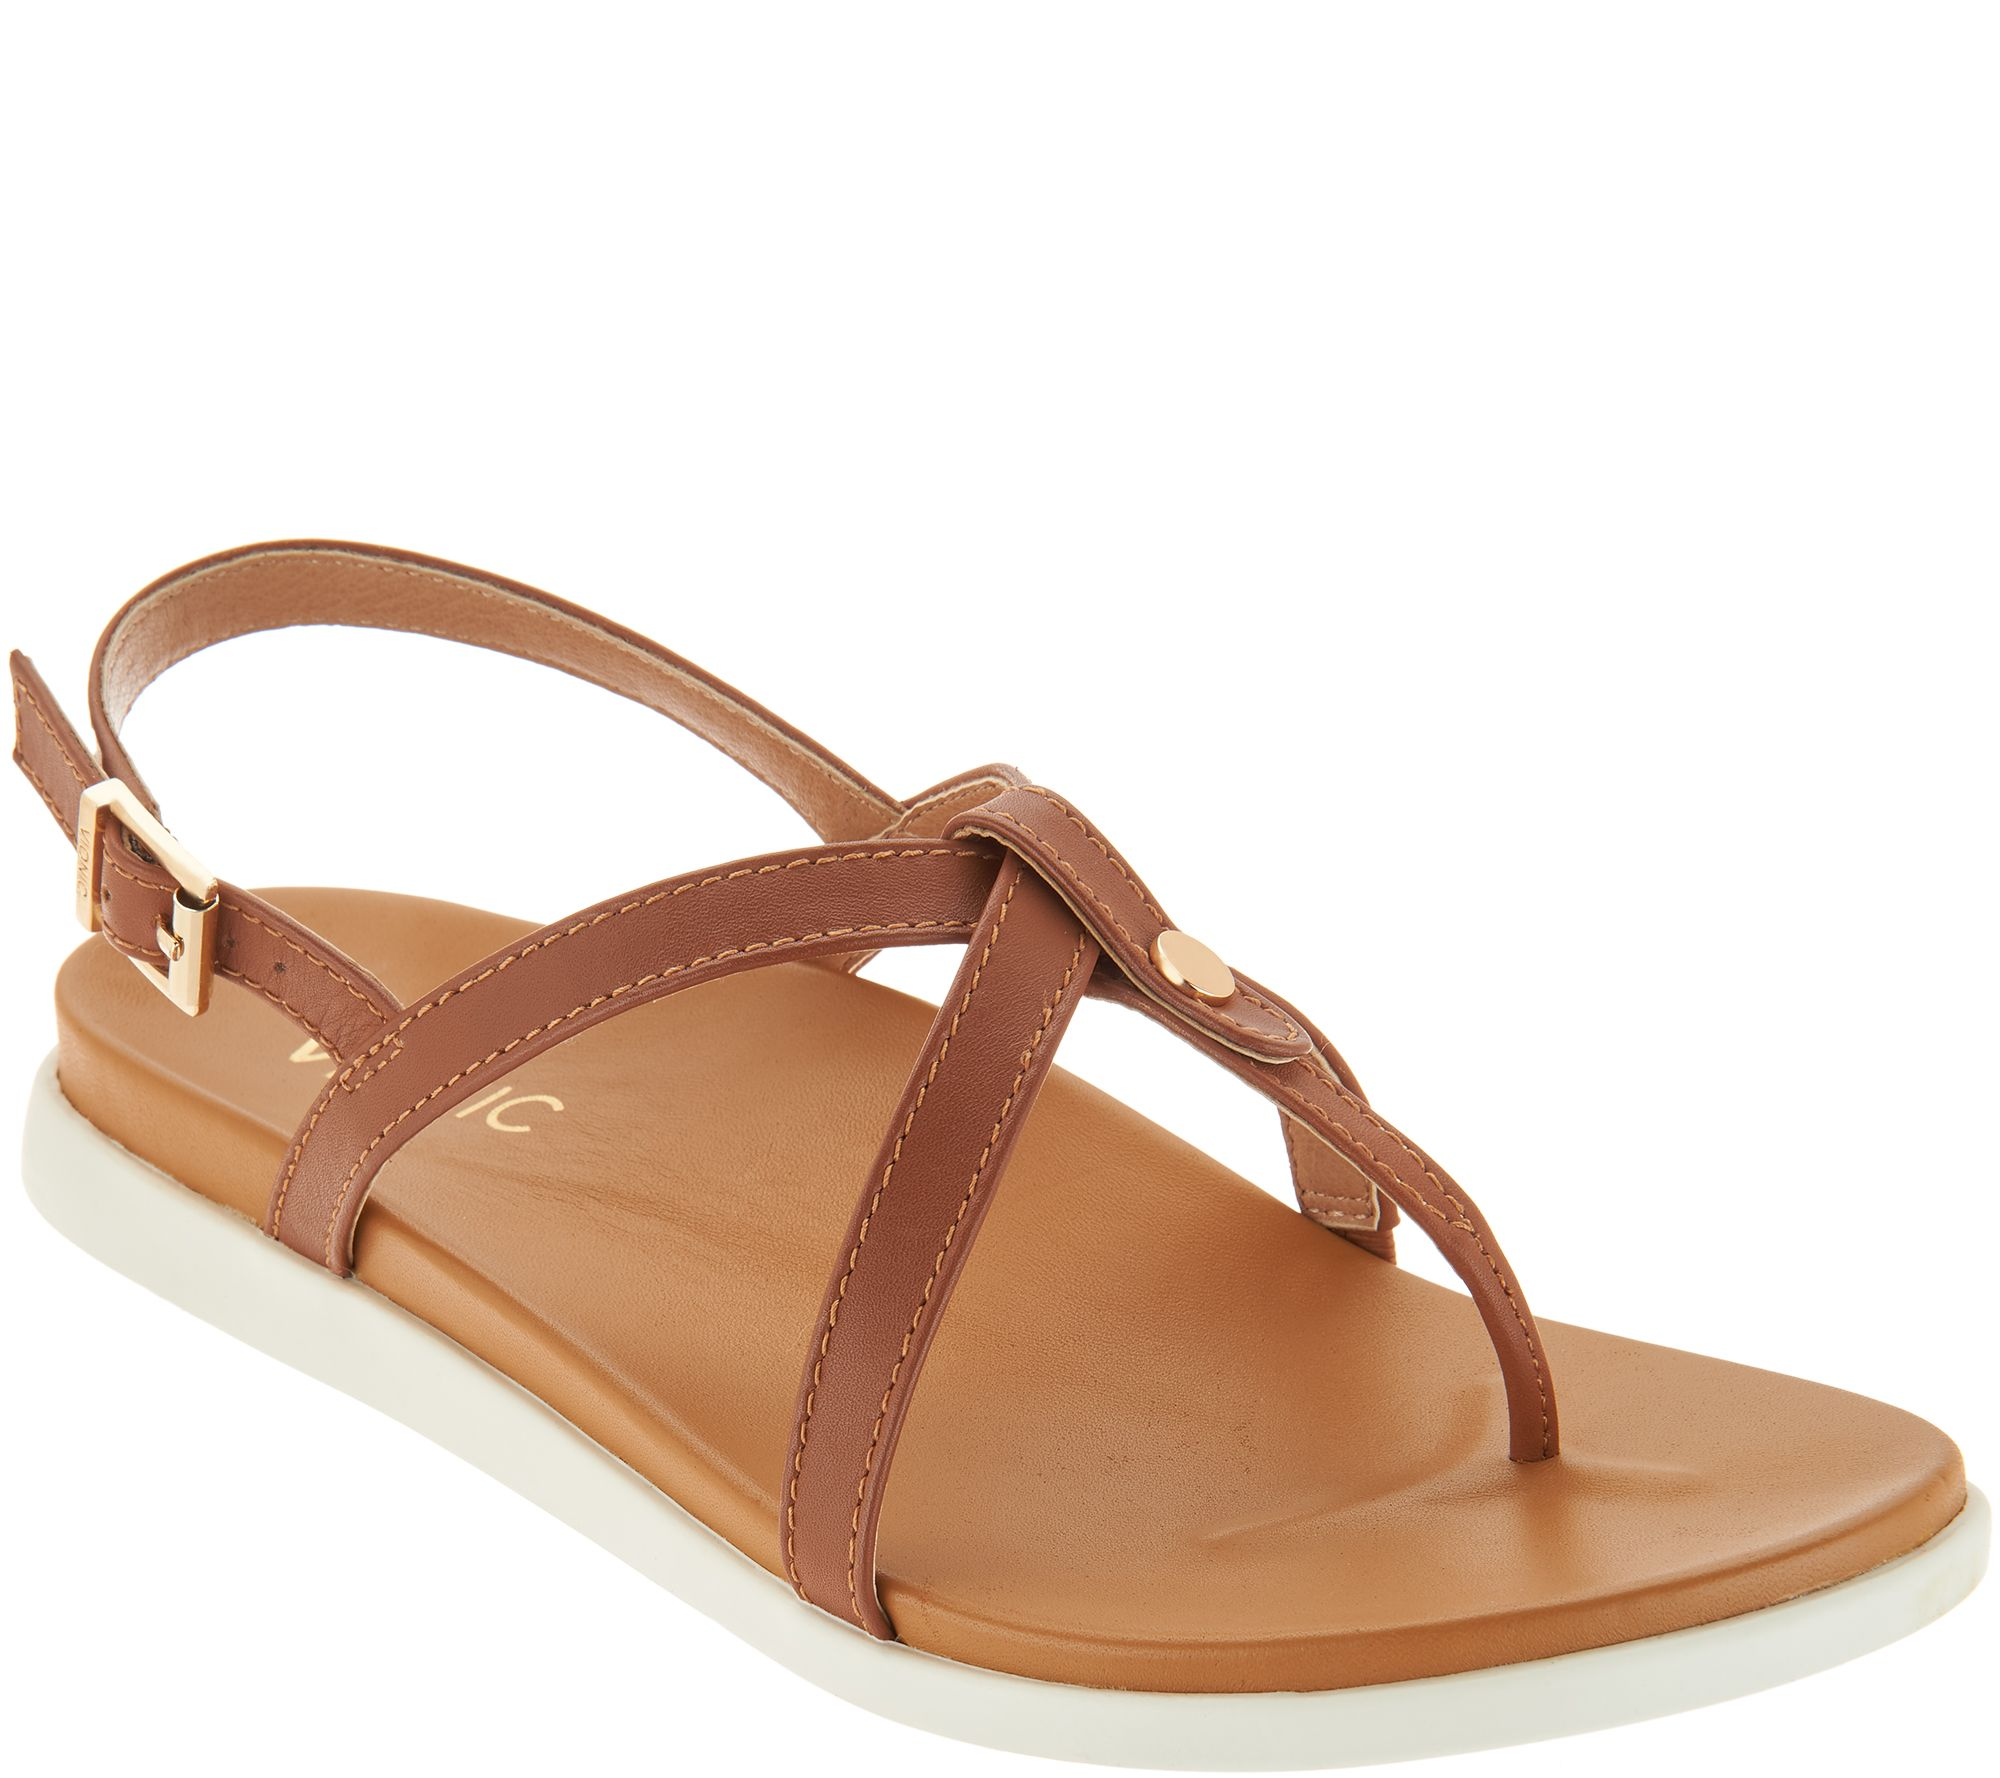 6dcb56f5cec Vionic Leather Thong Back-Strap Sandals - Veranda - Page 1 — QVC.com